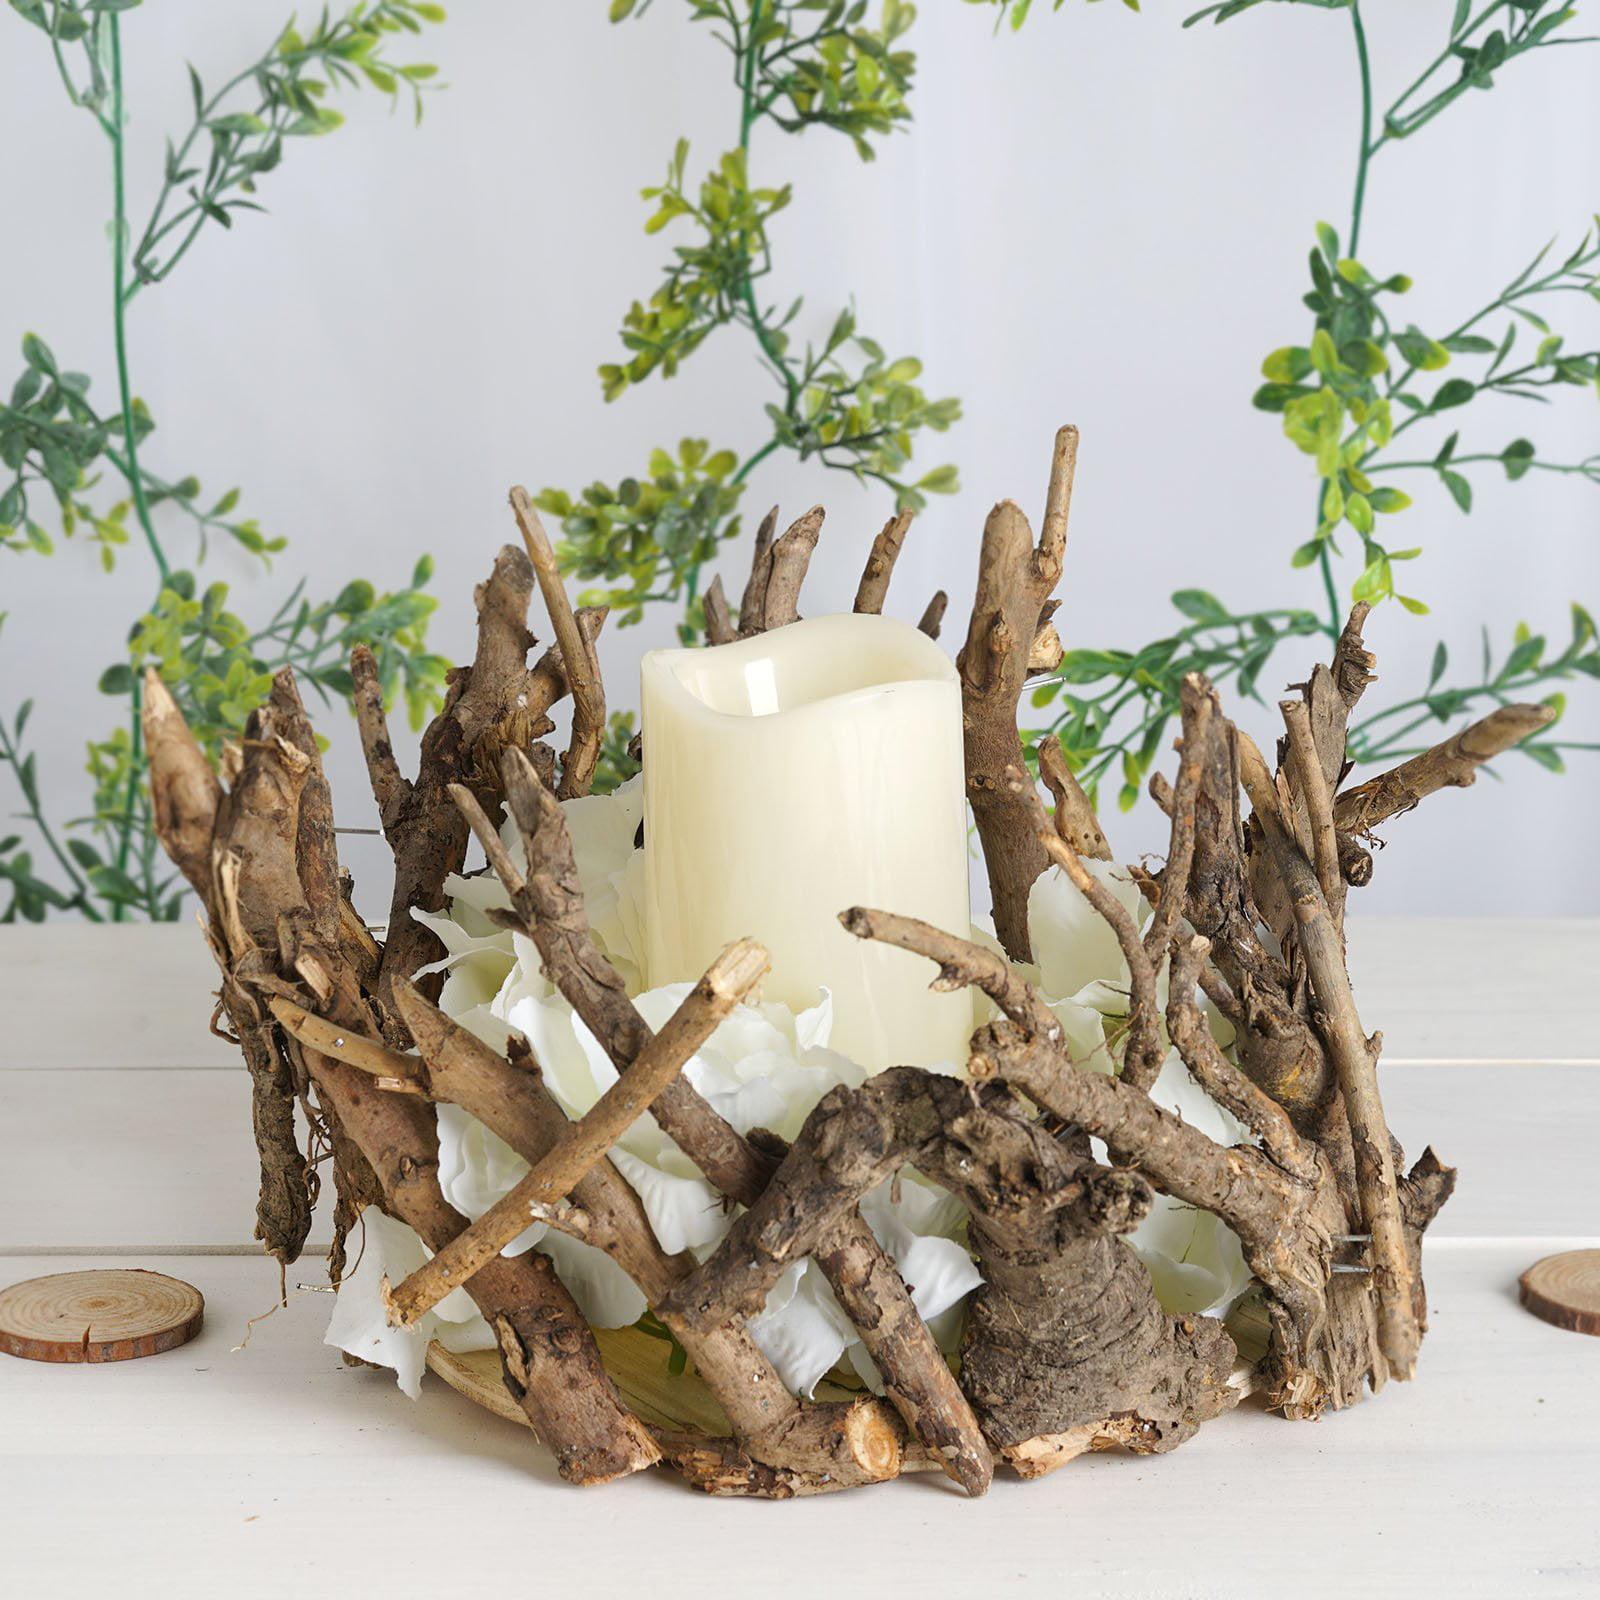 Efavormart Natural Wood Candle Holder Wooden Mini Flower Vase Rustic Wedding Centerpiece Rustic Wedding Centerpiece Walmart Com Walmart Com